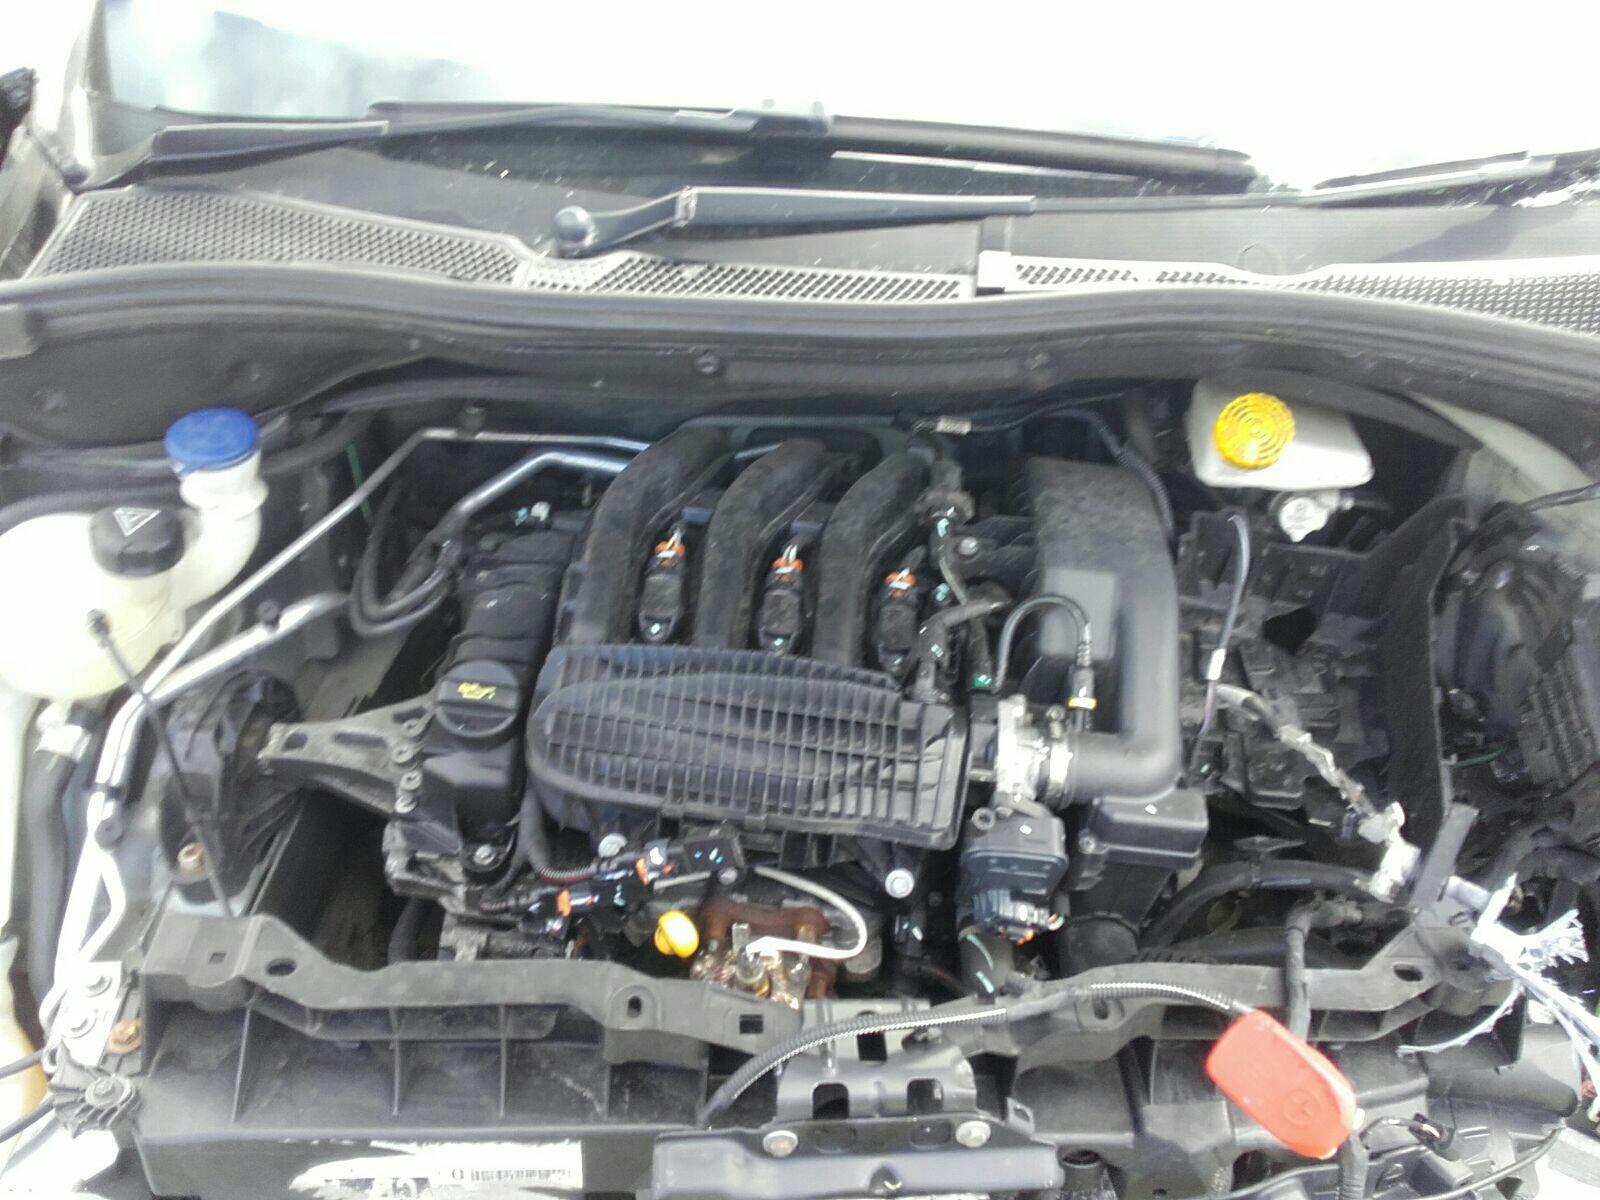 2013 Peugeot 208 2012 To 2015 Intuitive Vti 82 12cc Manual Petrol 605 Fuse Box 415 Parts Matching